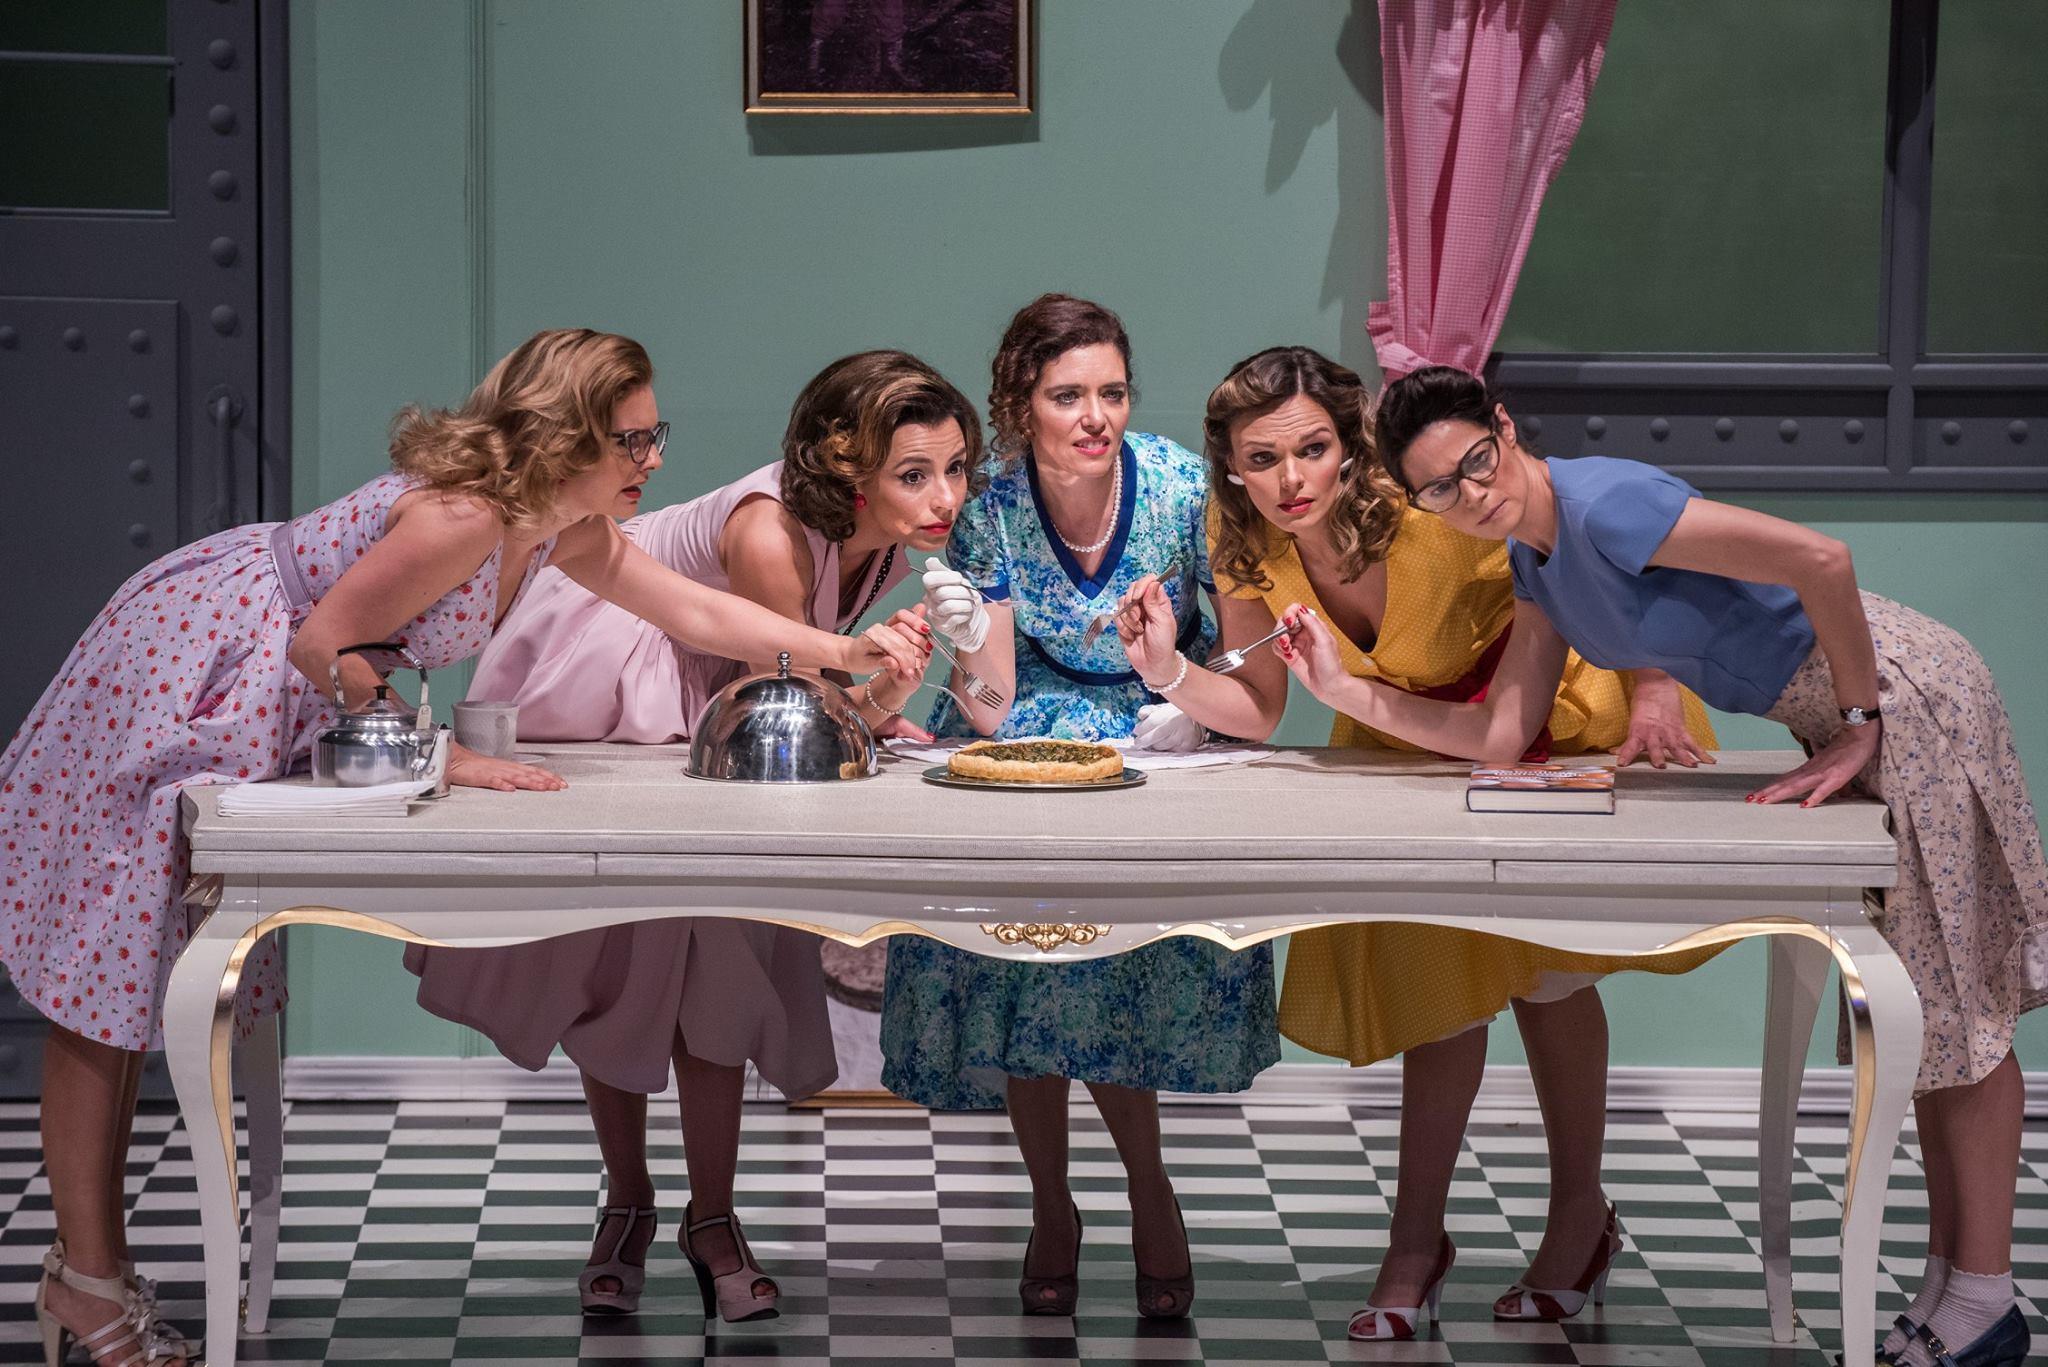 Ana Paula Rocha - Teatro – 5 lésbicas e 1 quiche – Abril 2018 - 002